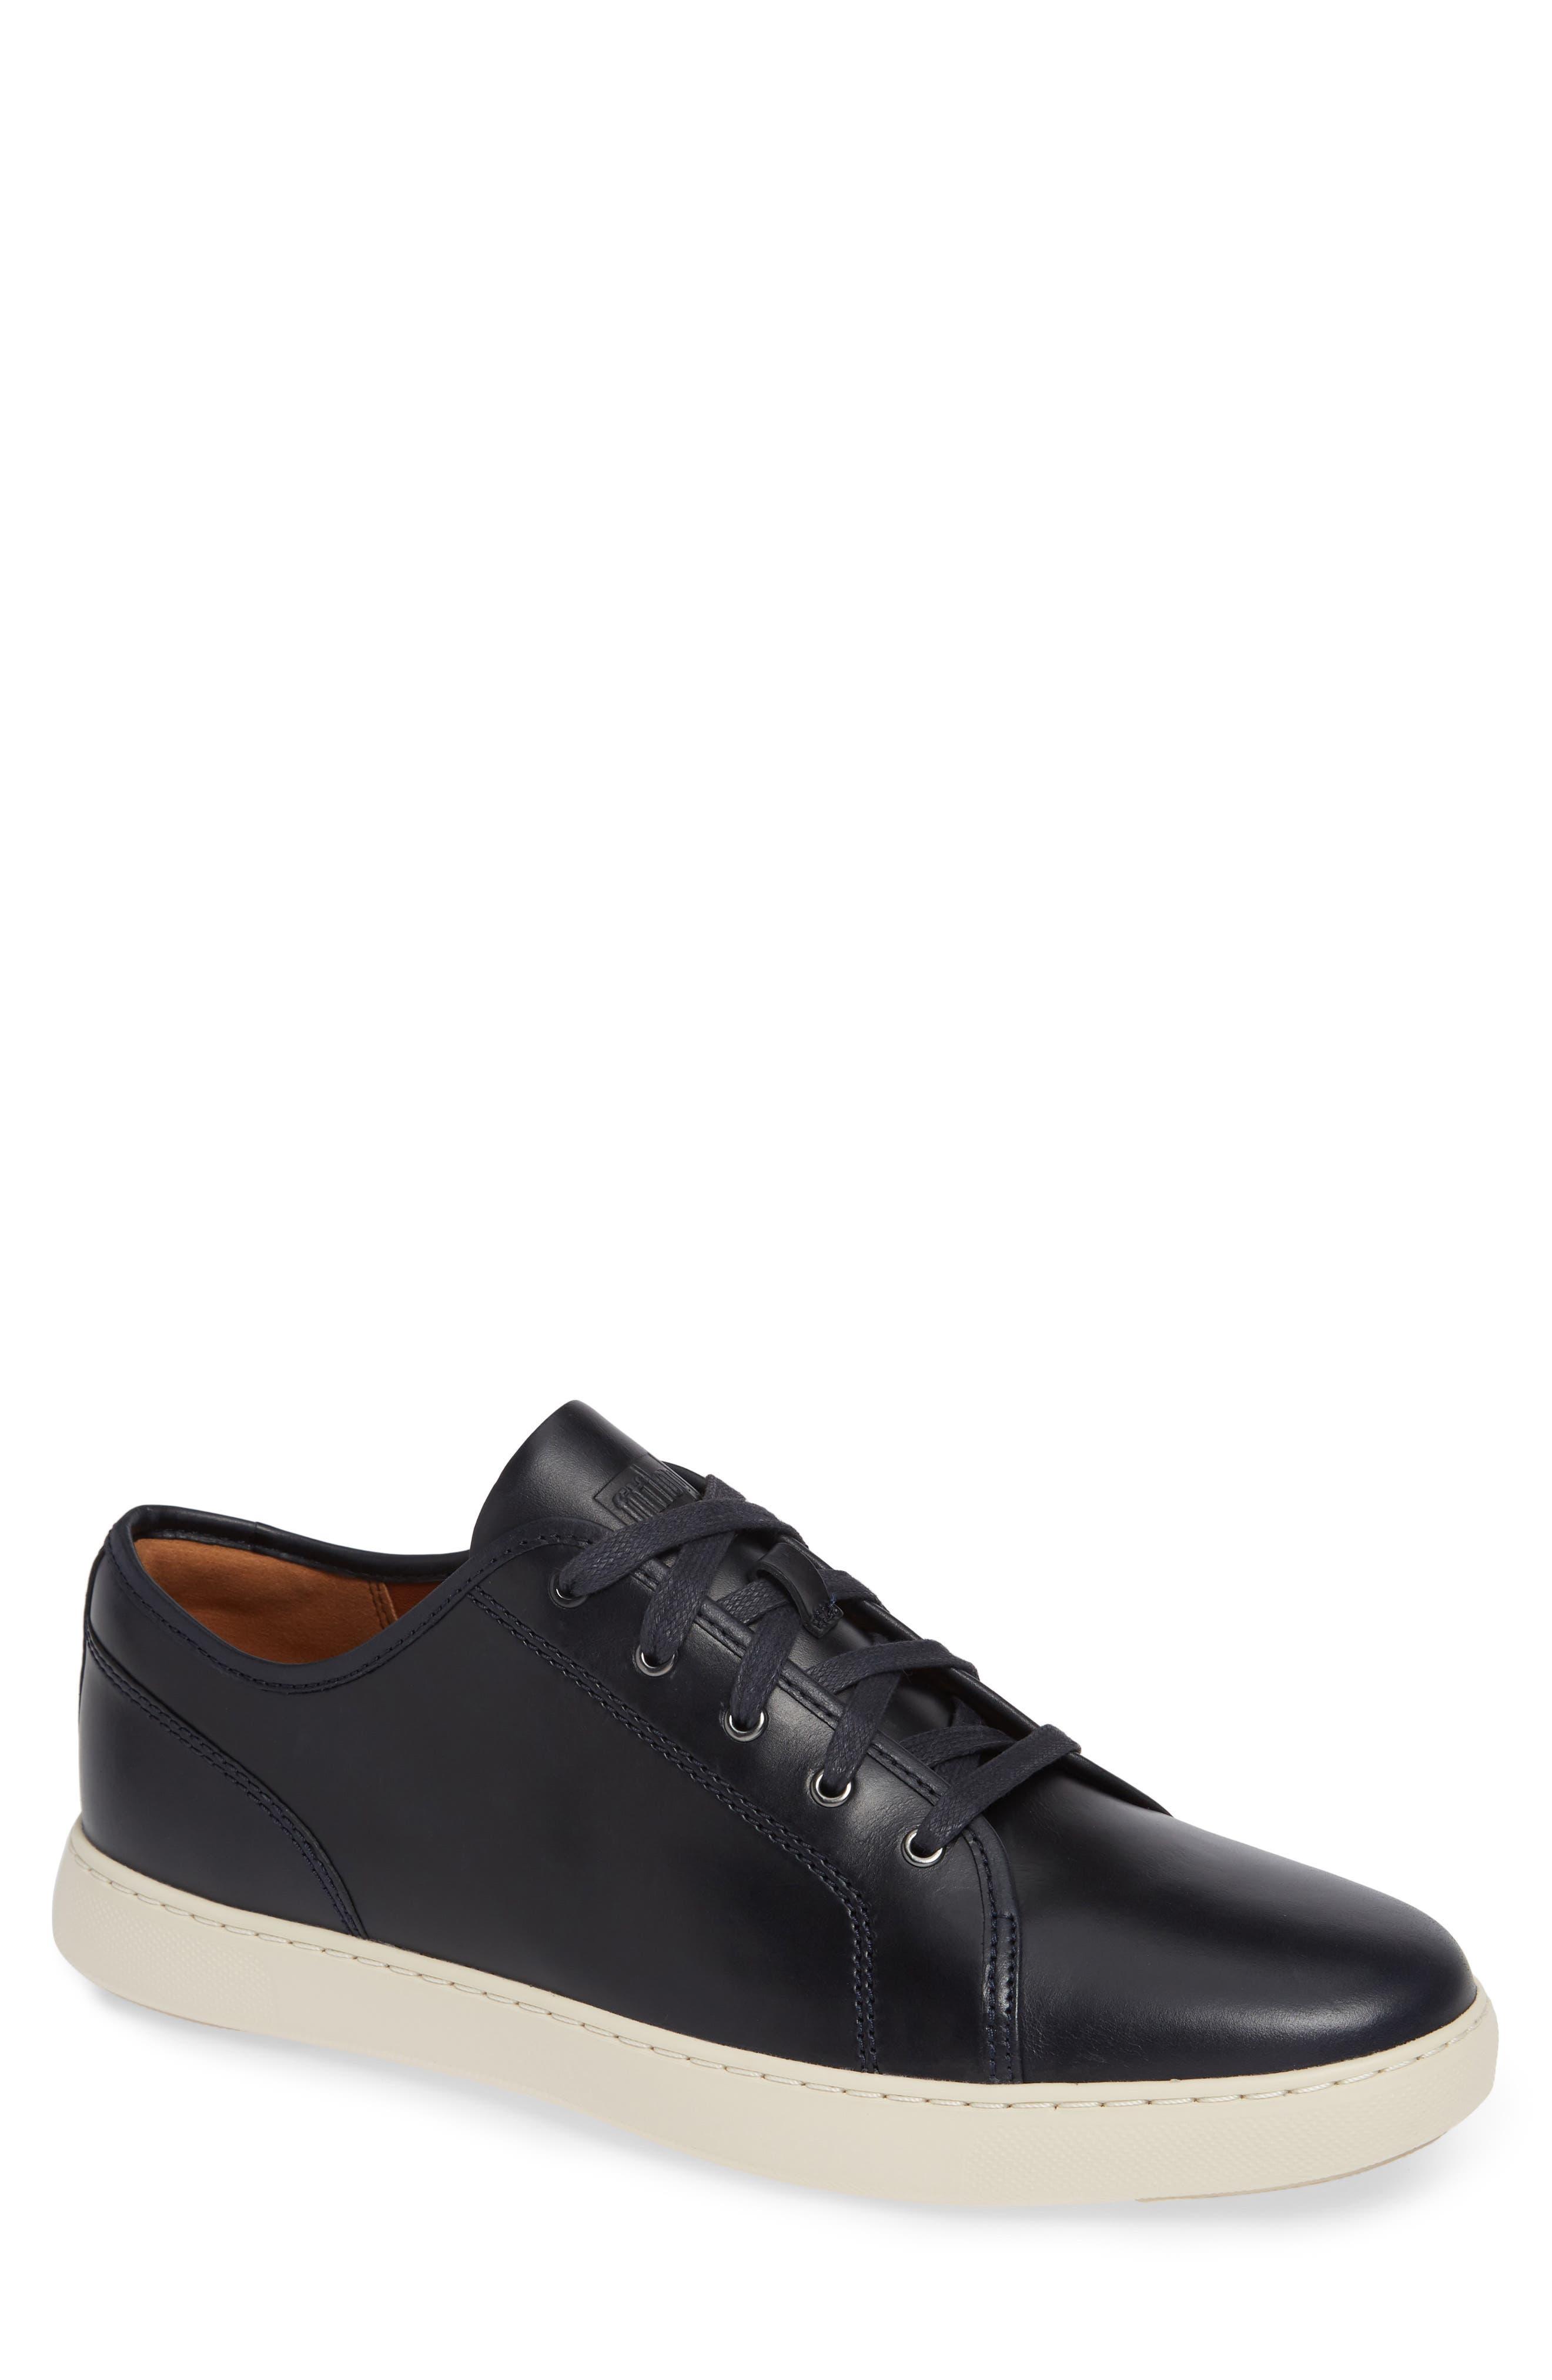 Christophe Low Top Sneaker,                         Main,                         color, SUPER NAVY